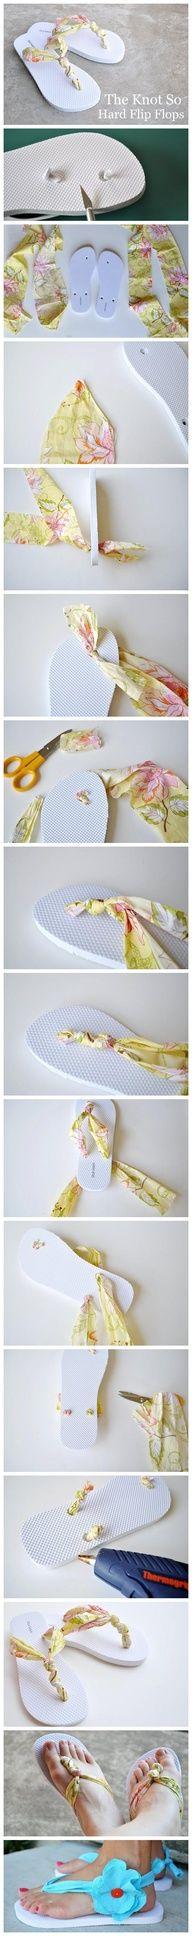 diy flip flops | DIY Flip Flop Decorating Idea - Beach Wedding - Bridesmaids